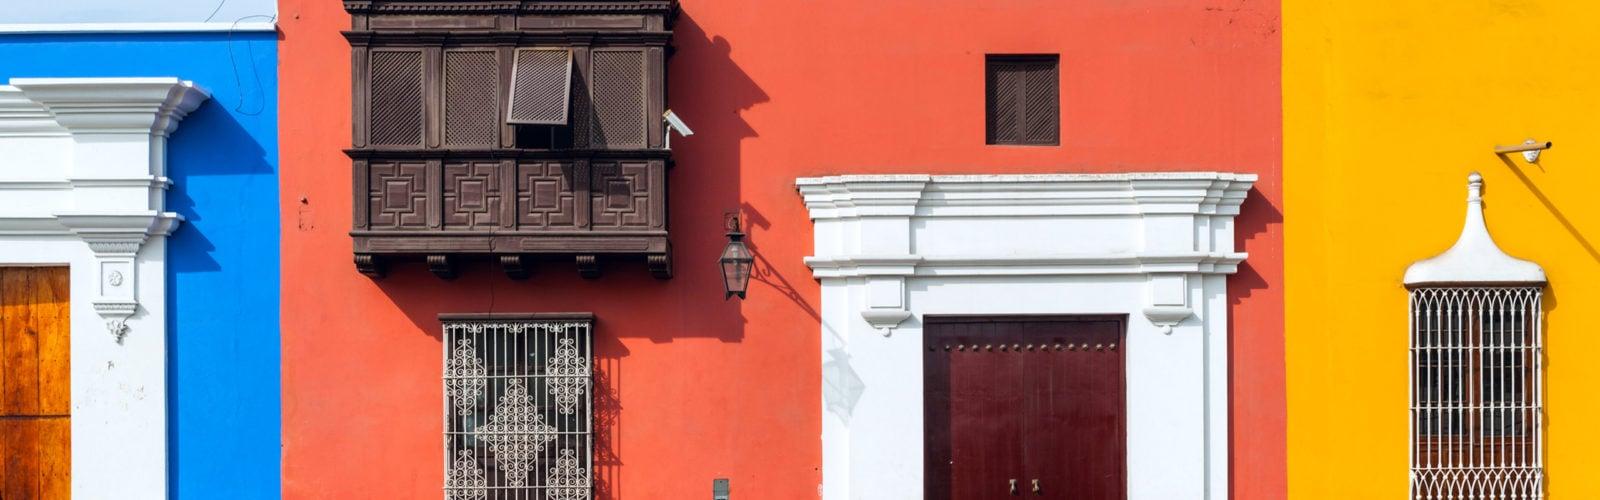 trujillo-colourful-houses